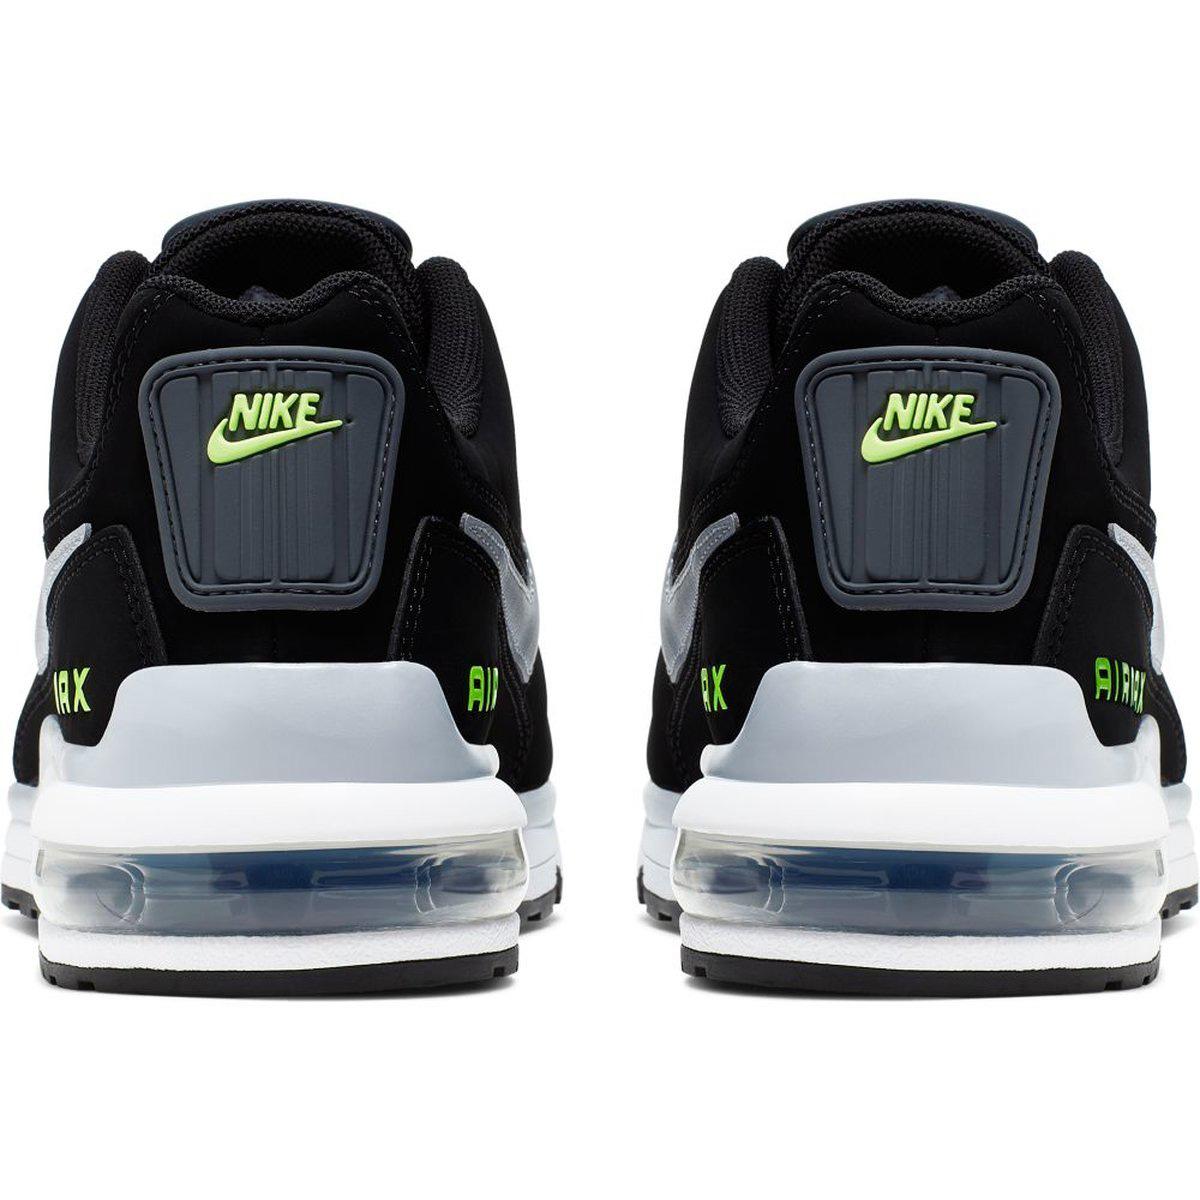 Nike Air Max LTD 3 Herren Sneaker schwarz grau neongelb